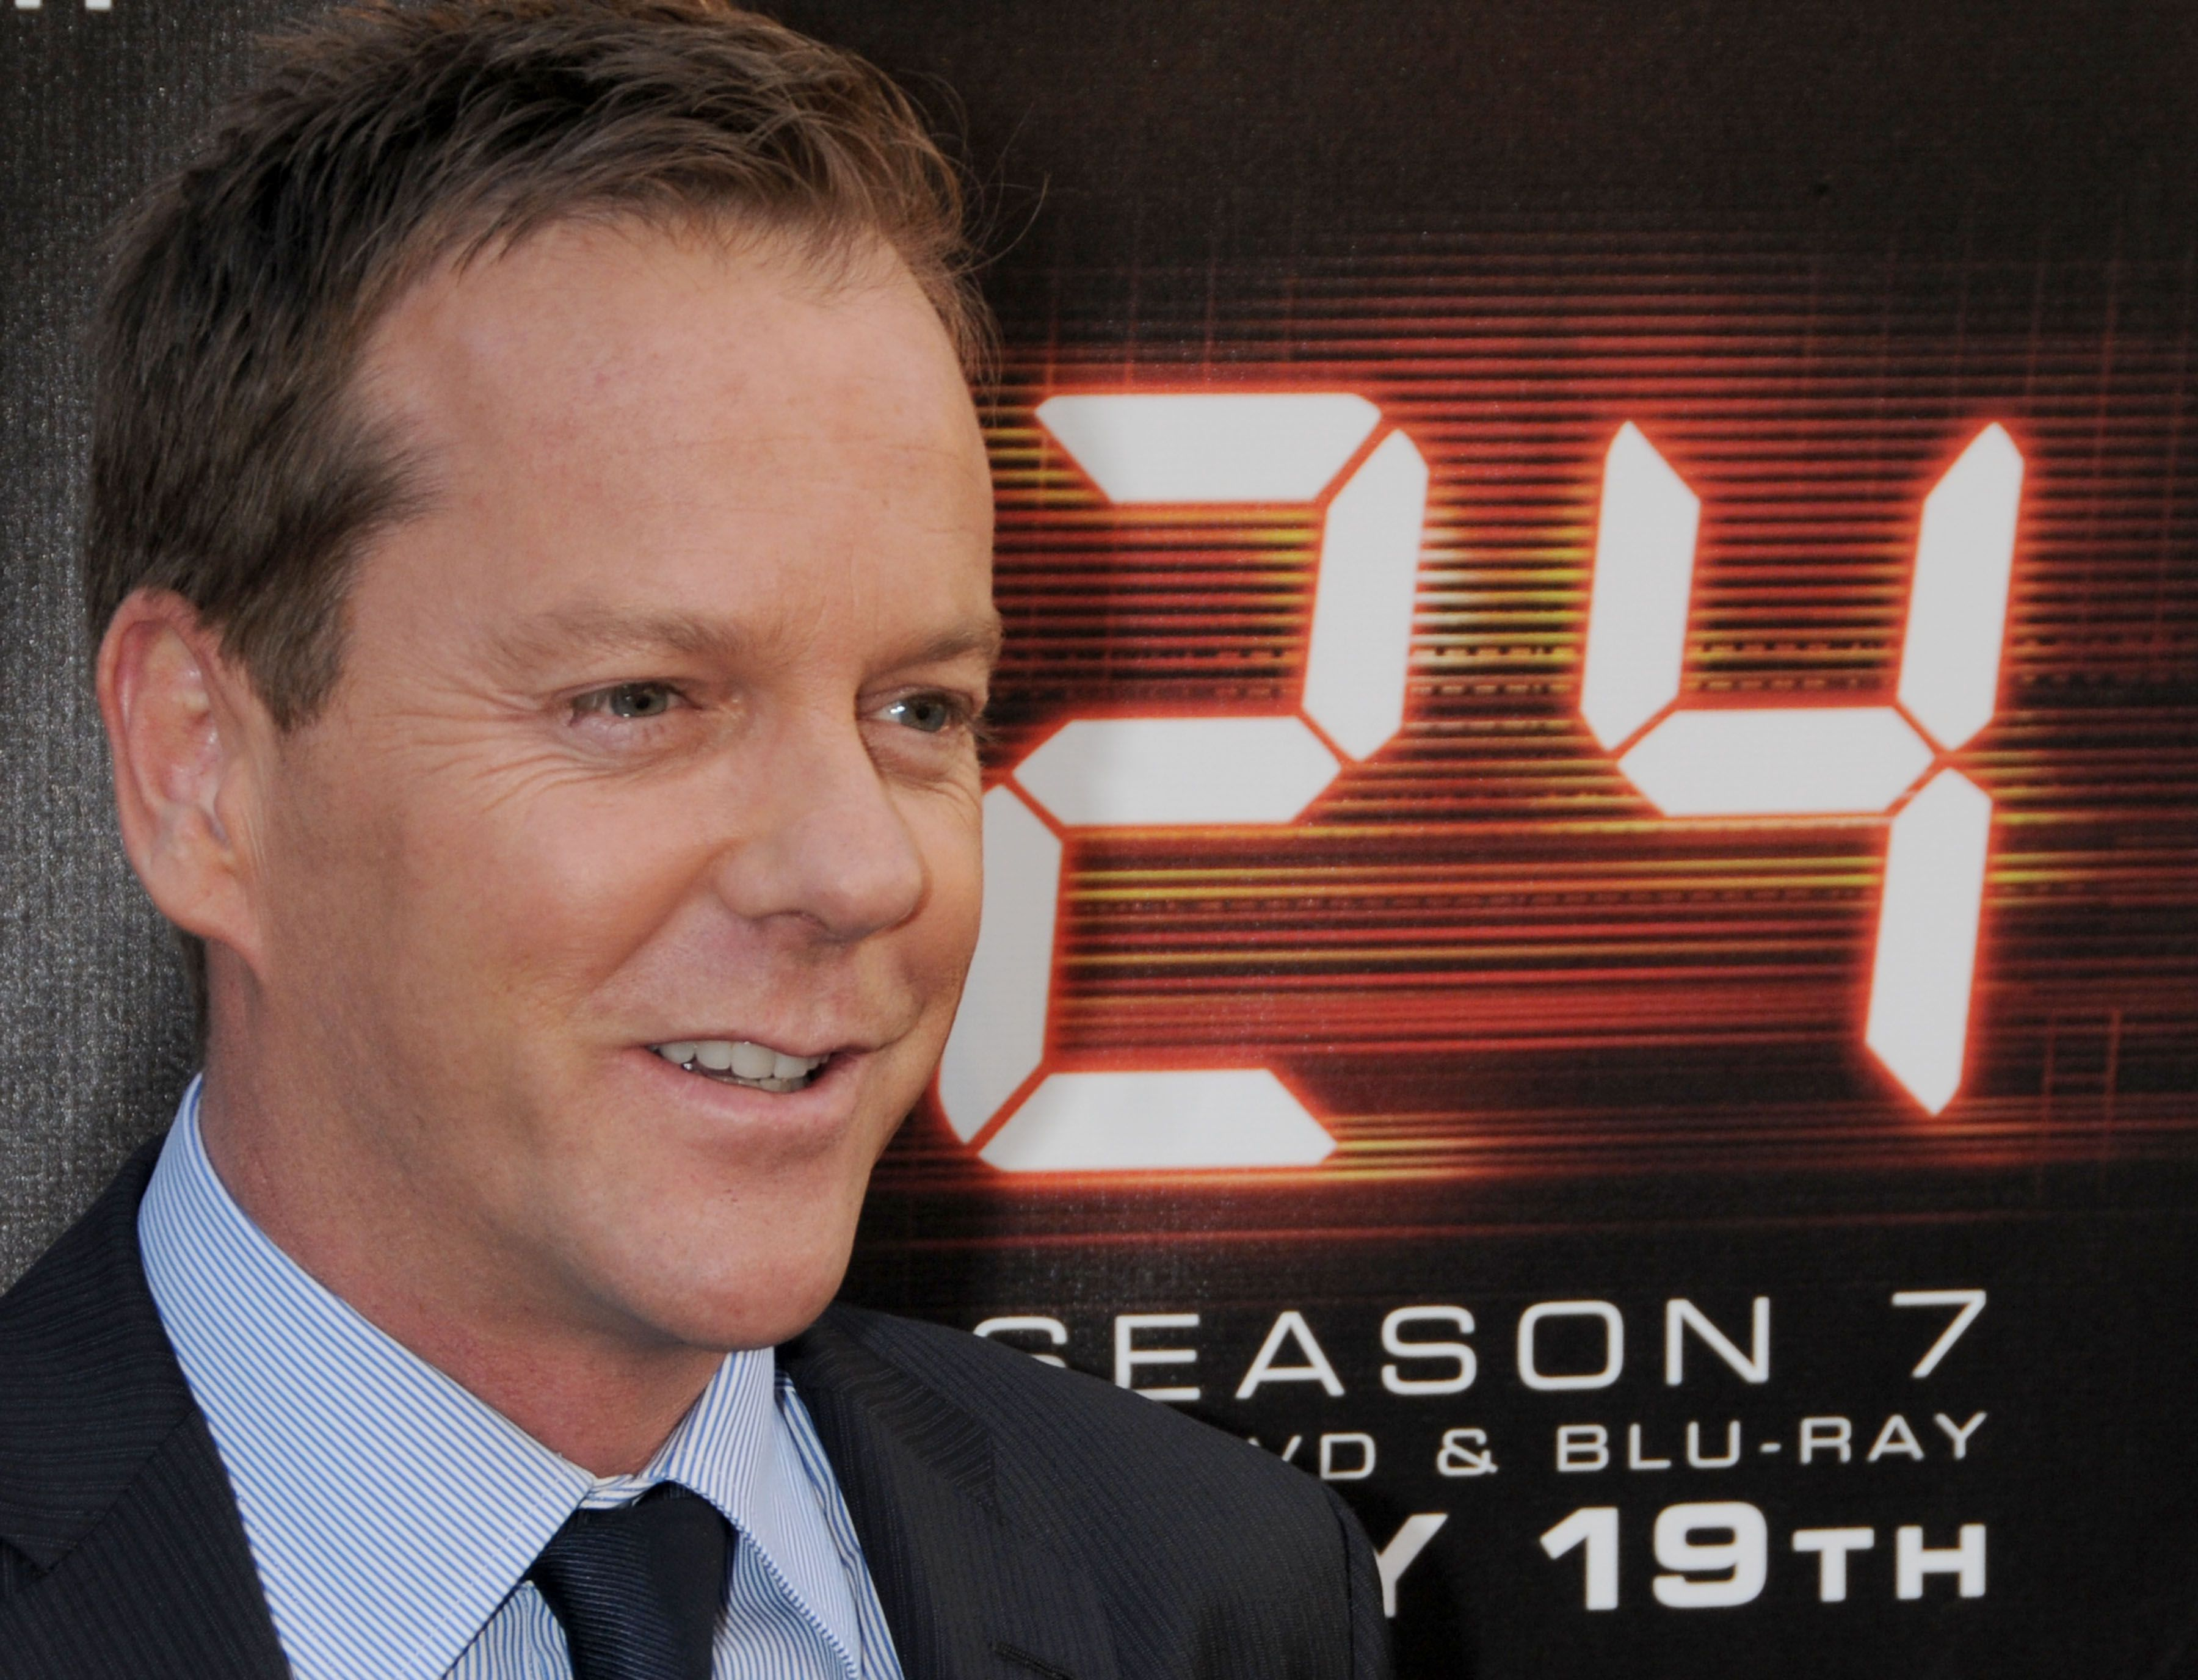 '24 Season Seven' Season Finale Screening